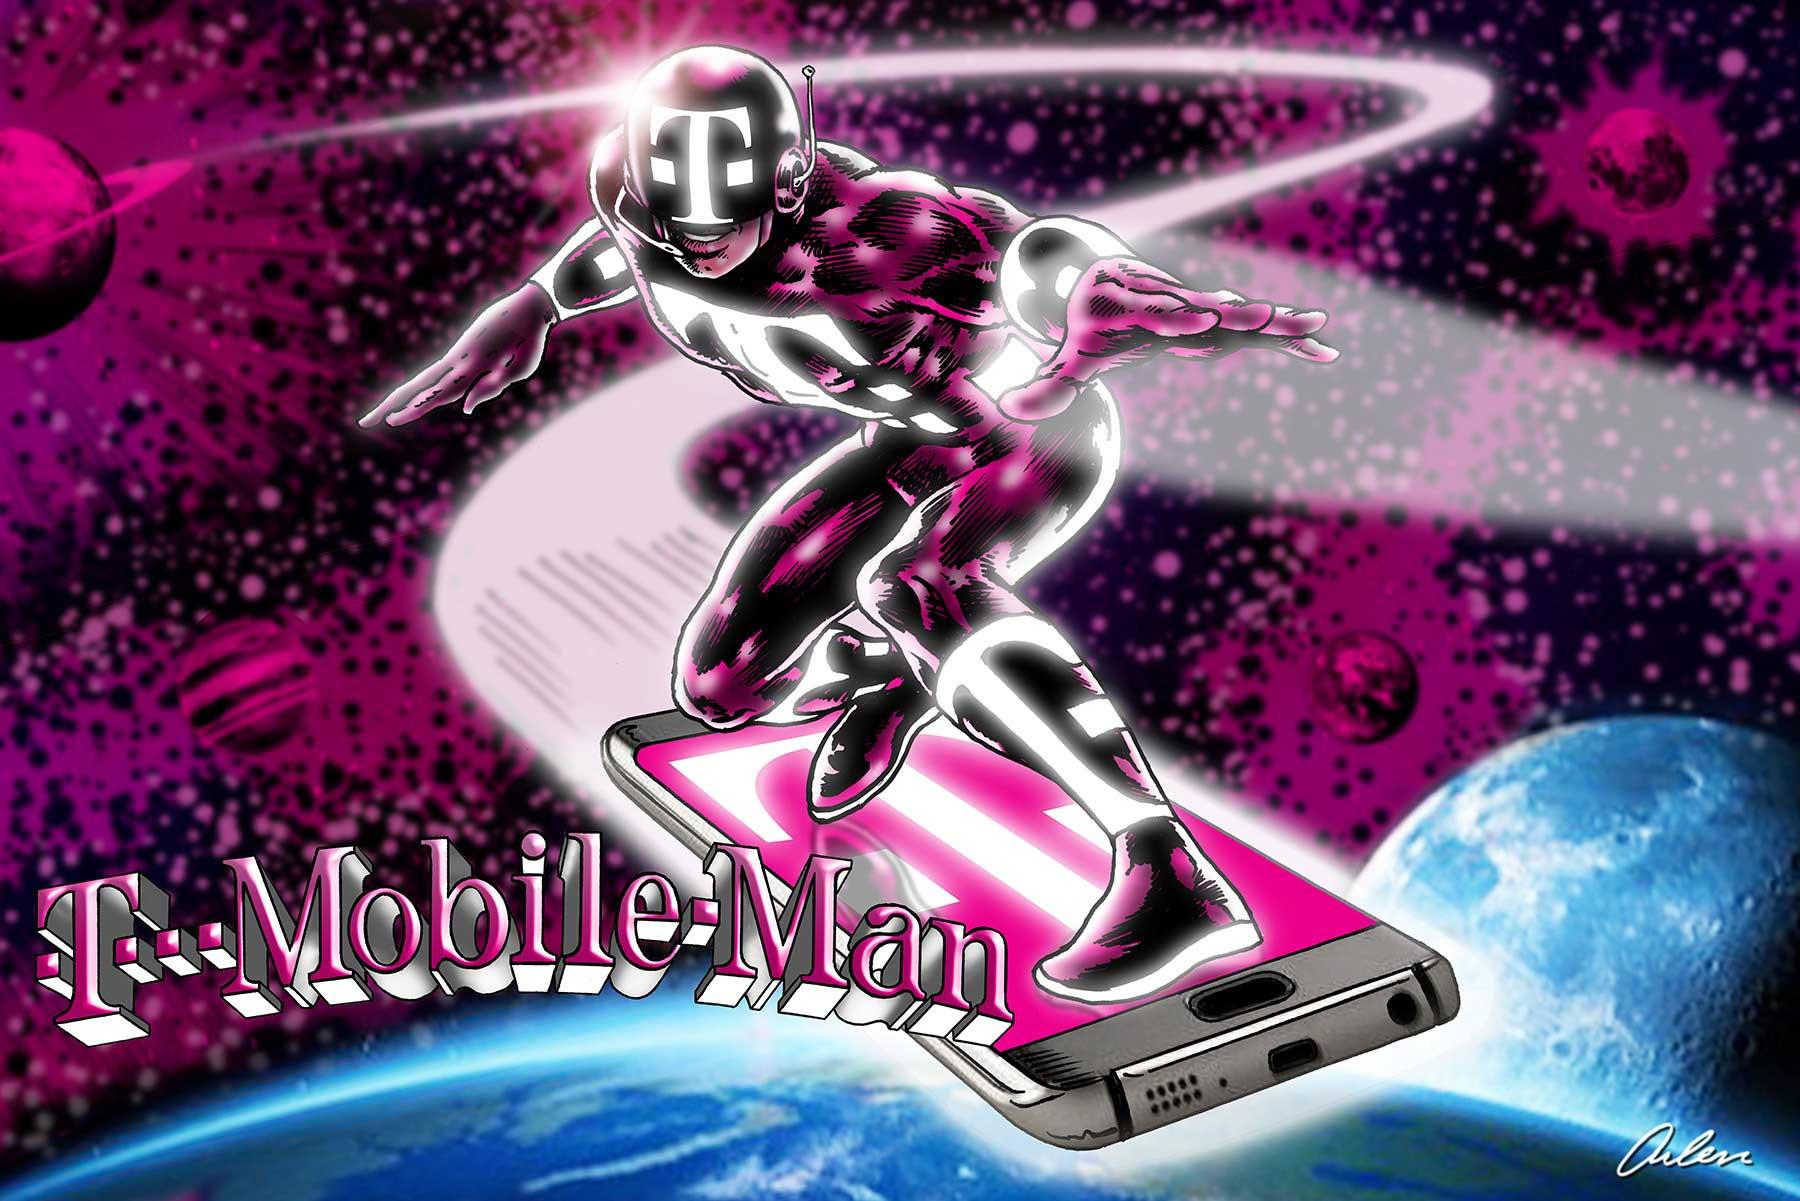 Arlen Schumer / T-Mobile Man Poster